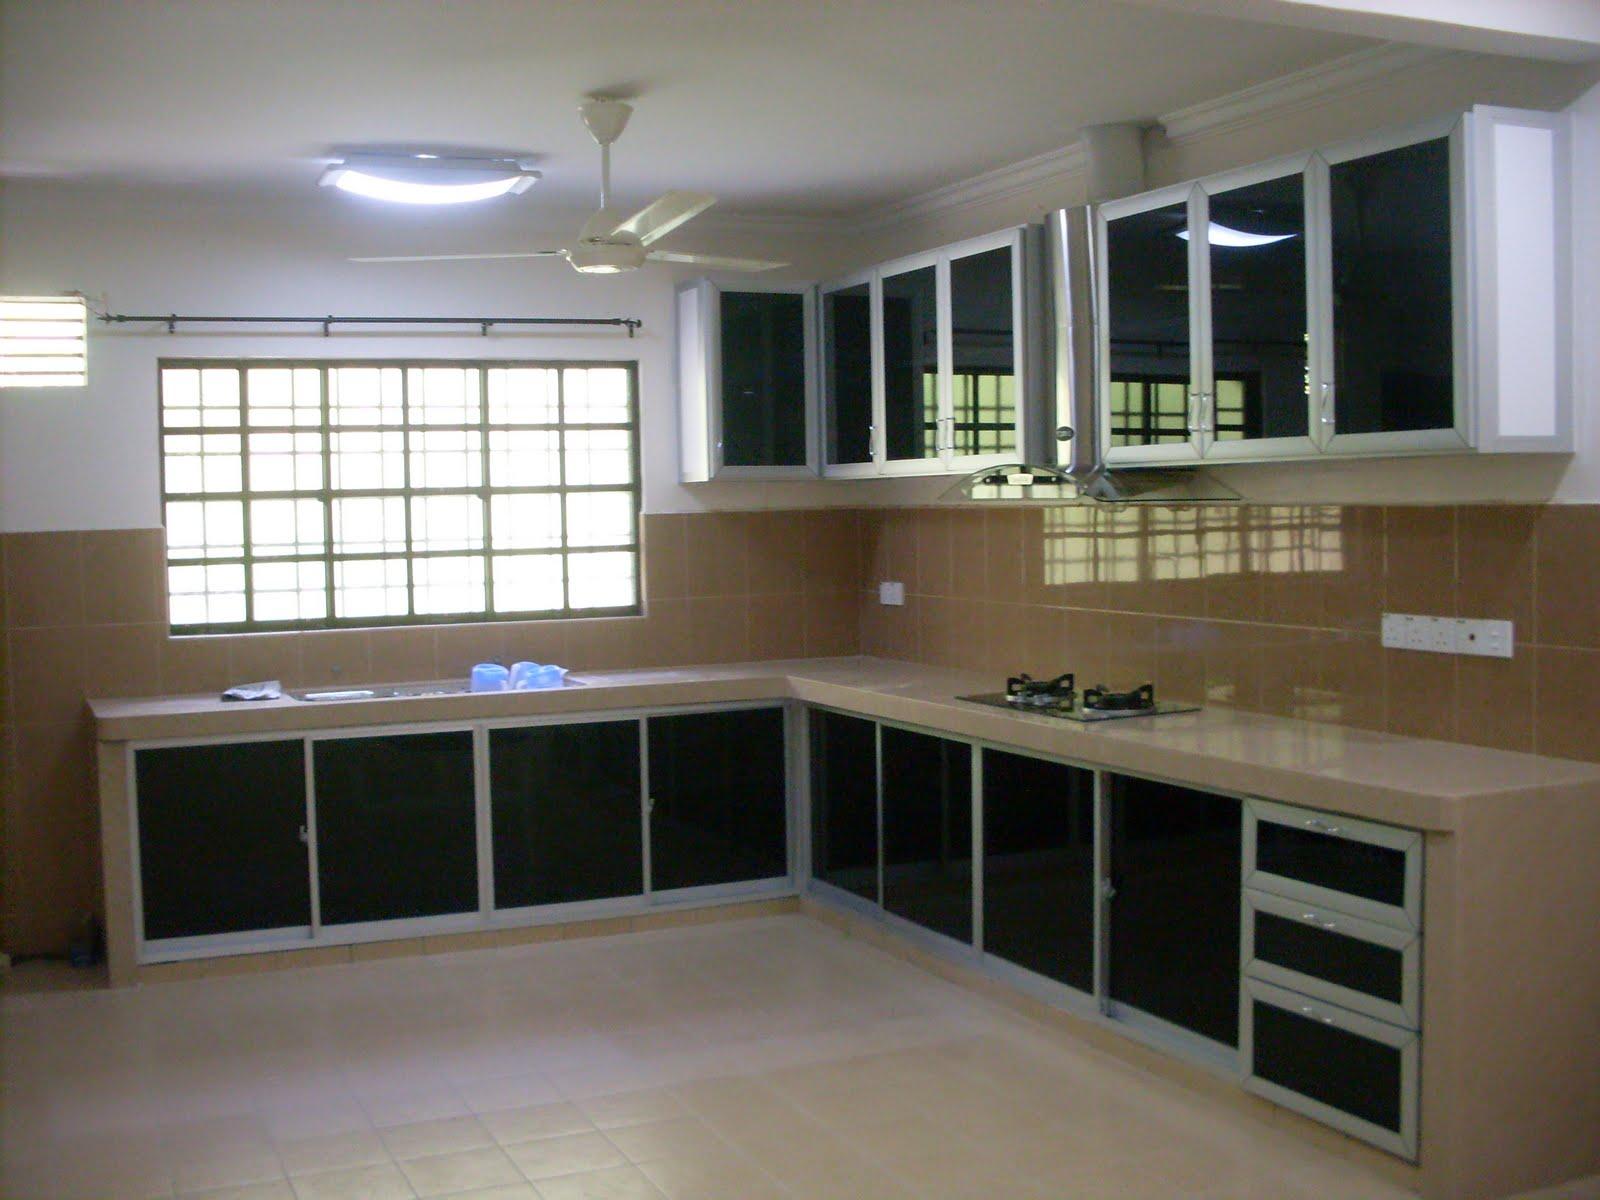 Keran Mencari Design Yang Sesuai Ketahanan Tahan Lama Dan Terpenting Harga Berpatutan Telah Mendorong Saya Untuk Membuat Kitchen Cabinet